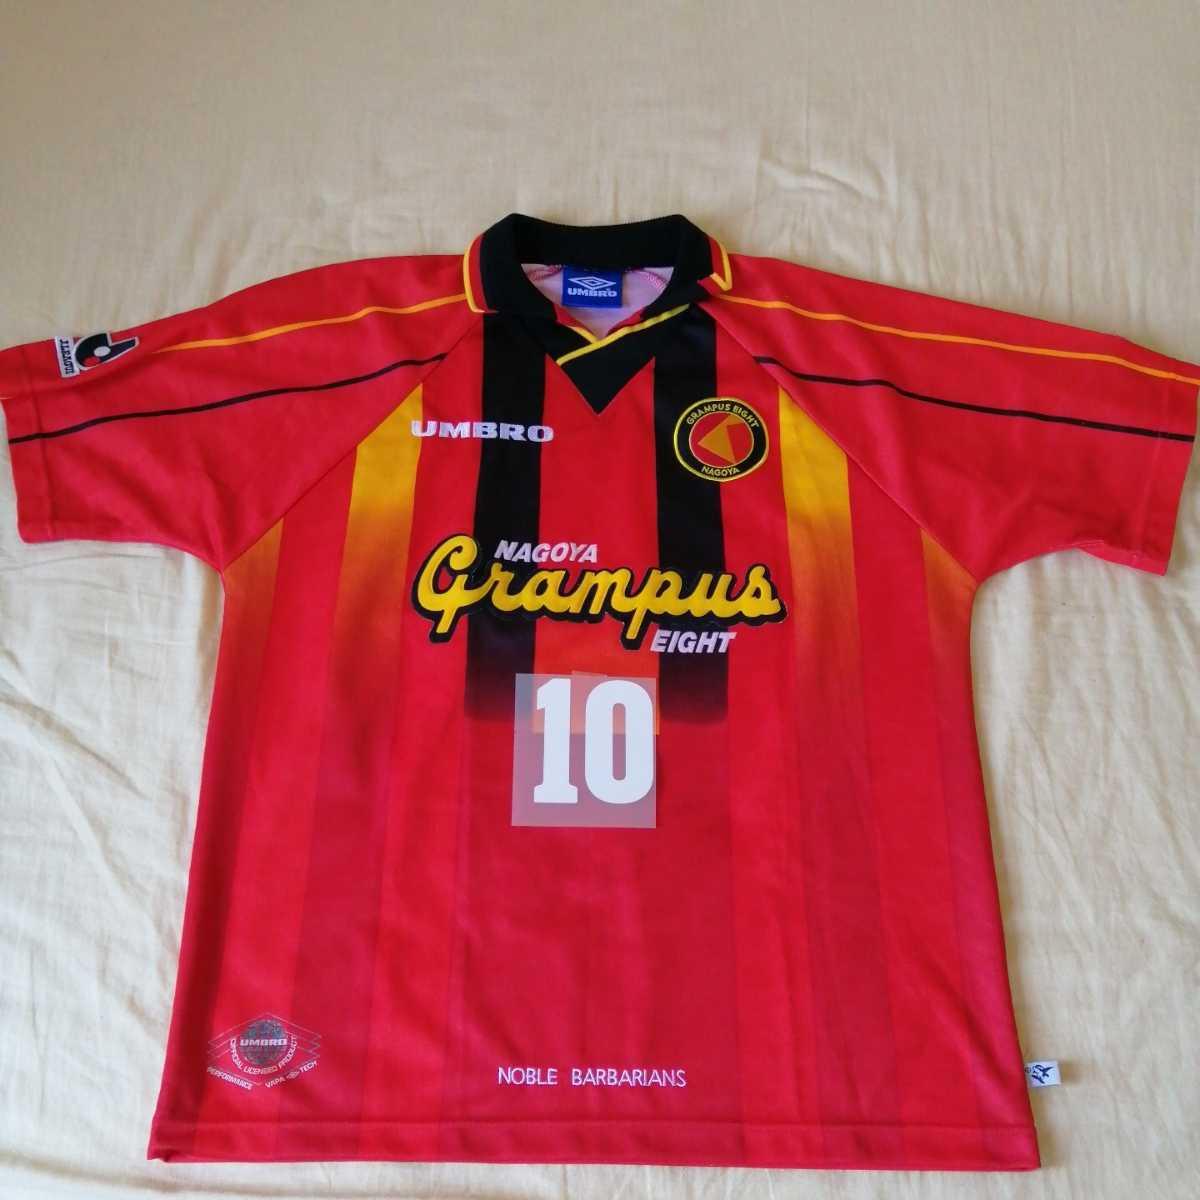 UMBRO正規 名古屋グランパス 1996/97 ストイコビッチ在籍時ユニフォーム ナンバーシート付き サイズ L